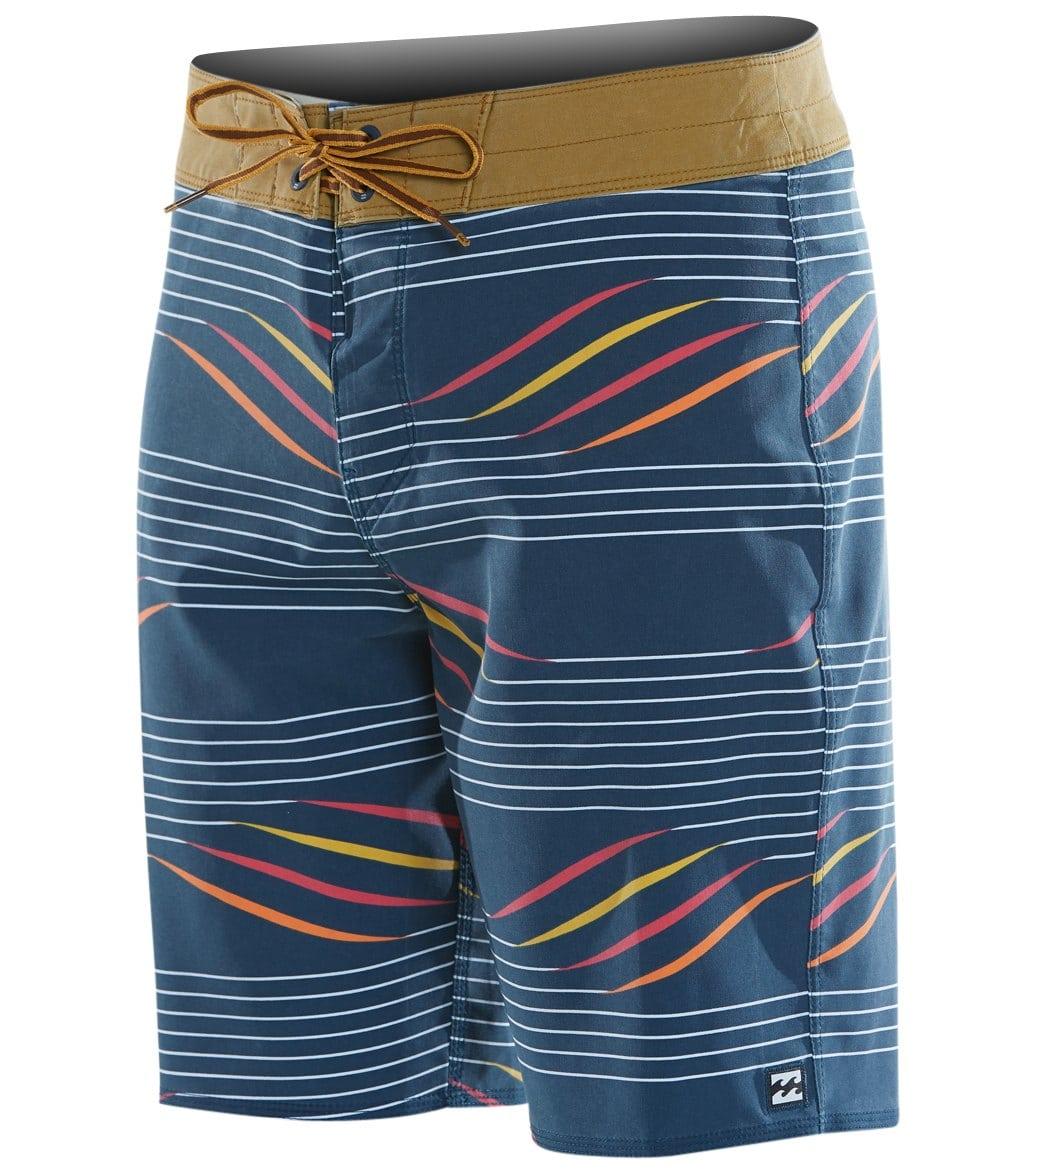 99bd2912d2 Billabong Men's Sundays X Stripe Boardshort at SwimOutlet.com - Free  Shipping